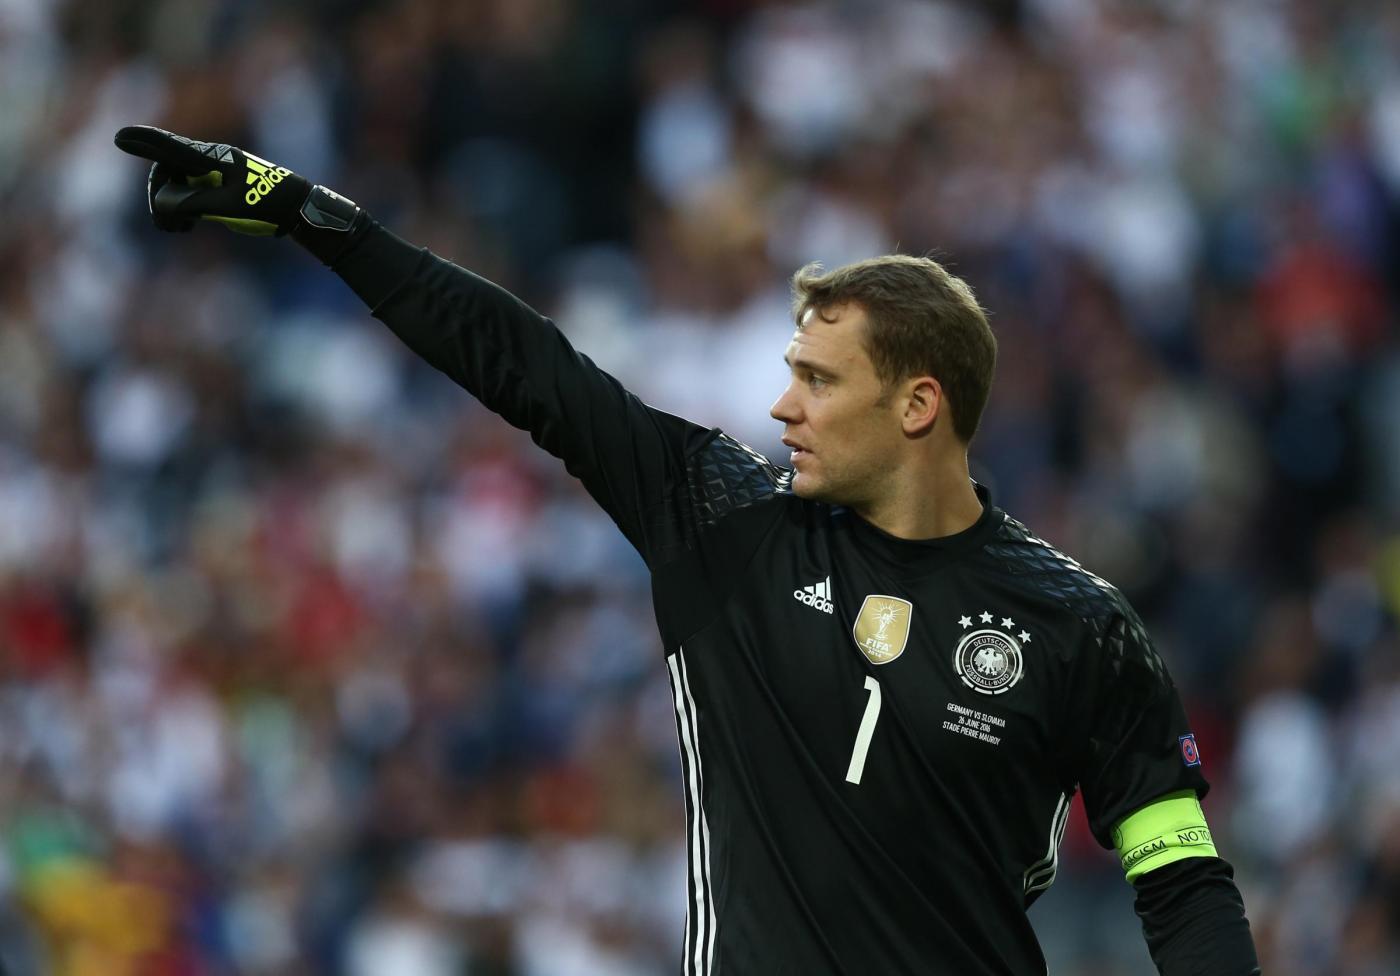 Euro 2016 Germania vs Slovacchia